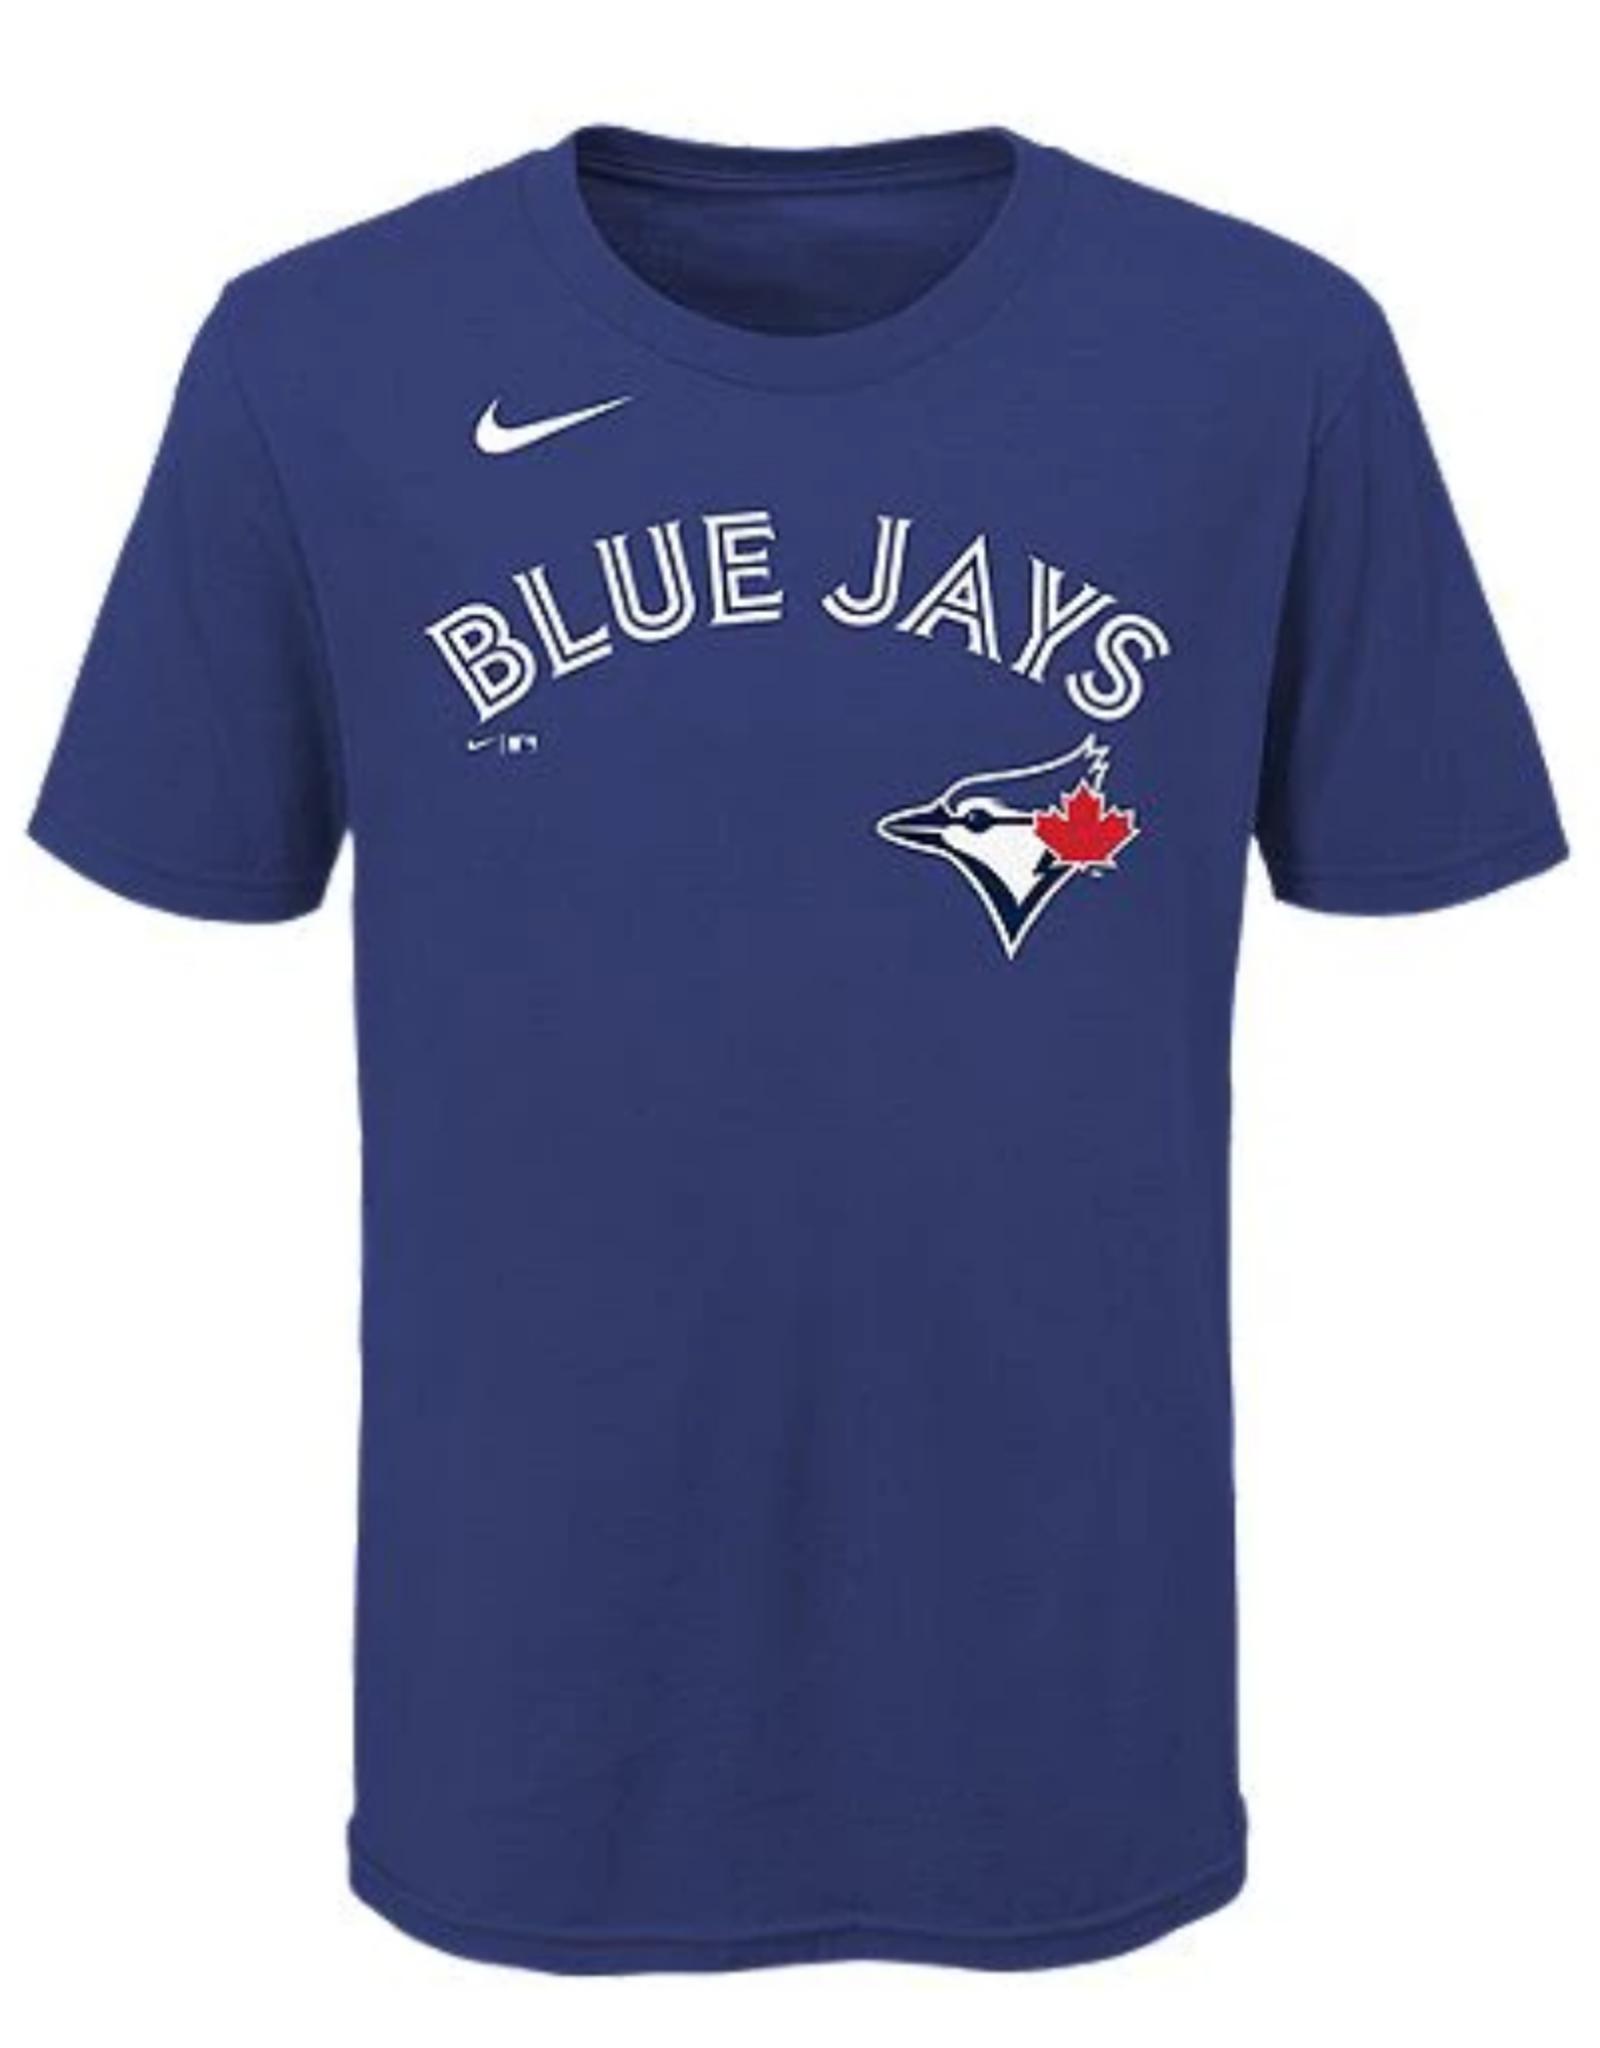 Nike Men's Player T-Shirt Bichette #11 Toronto Blue Jays Royal